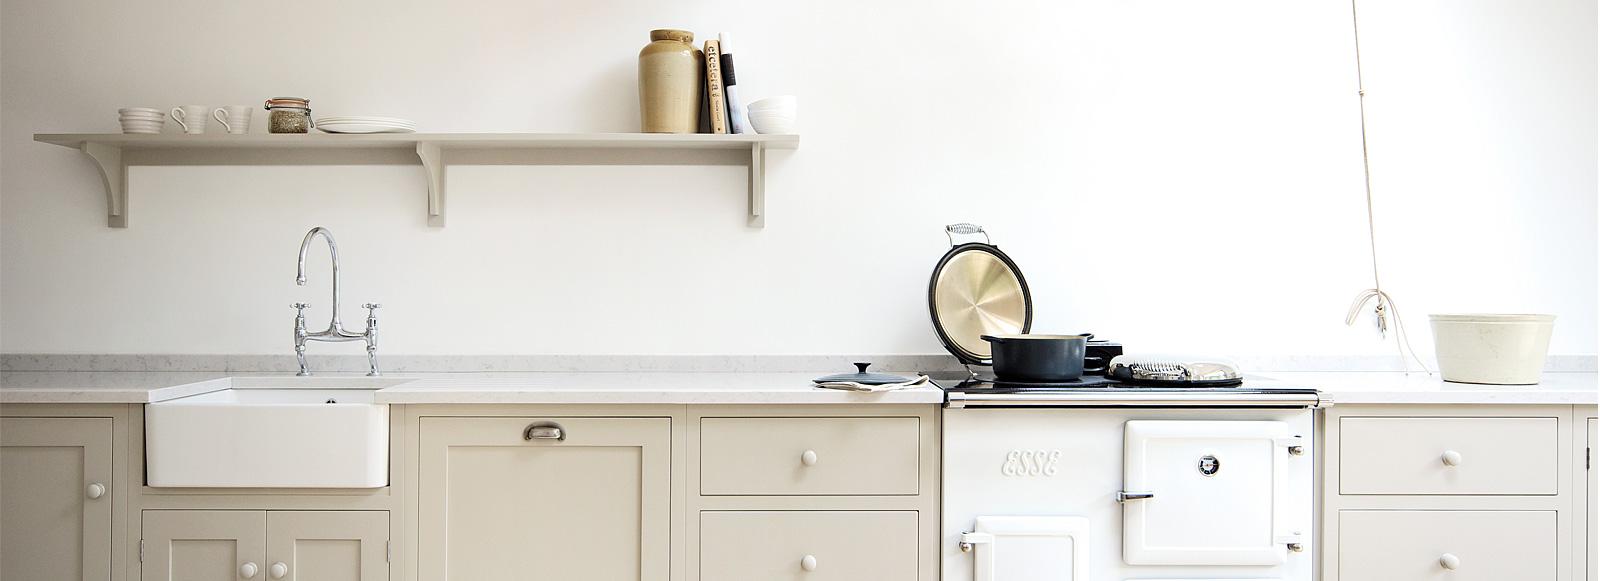 shaker-kitchen-london